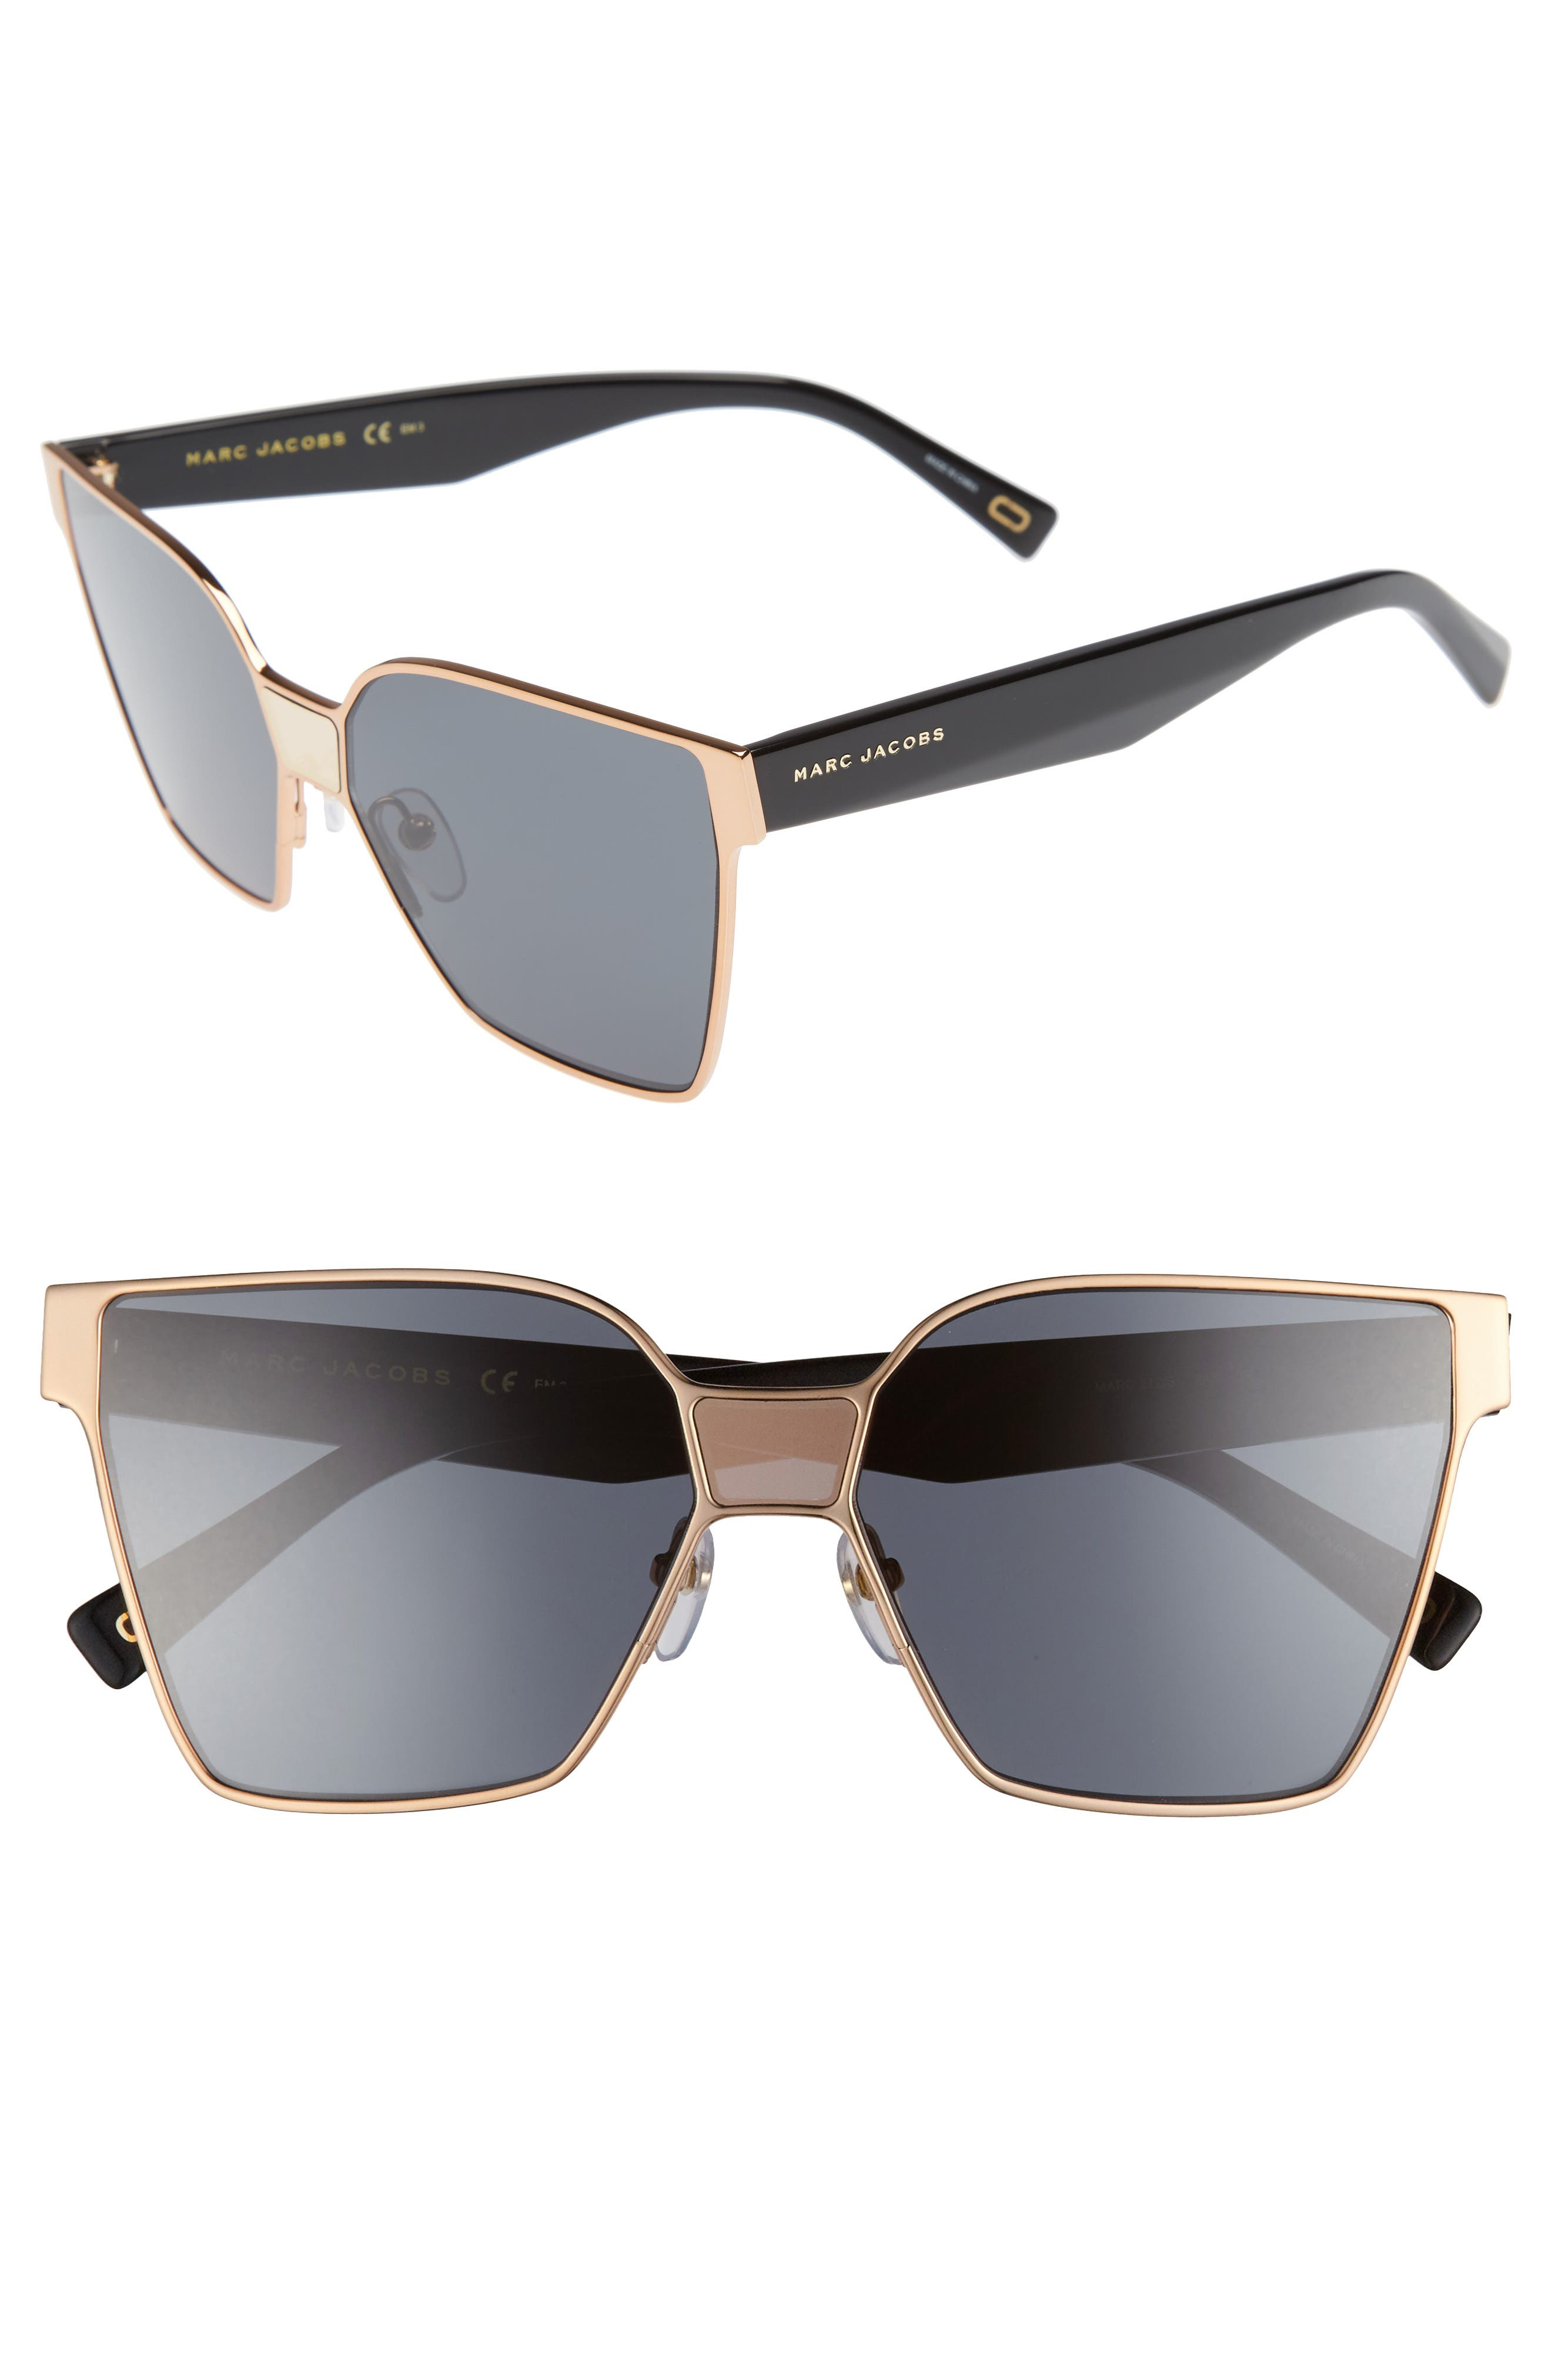 Main Image - MARC JACOBS 60mm Square Sunglasses